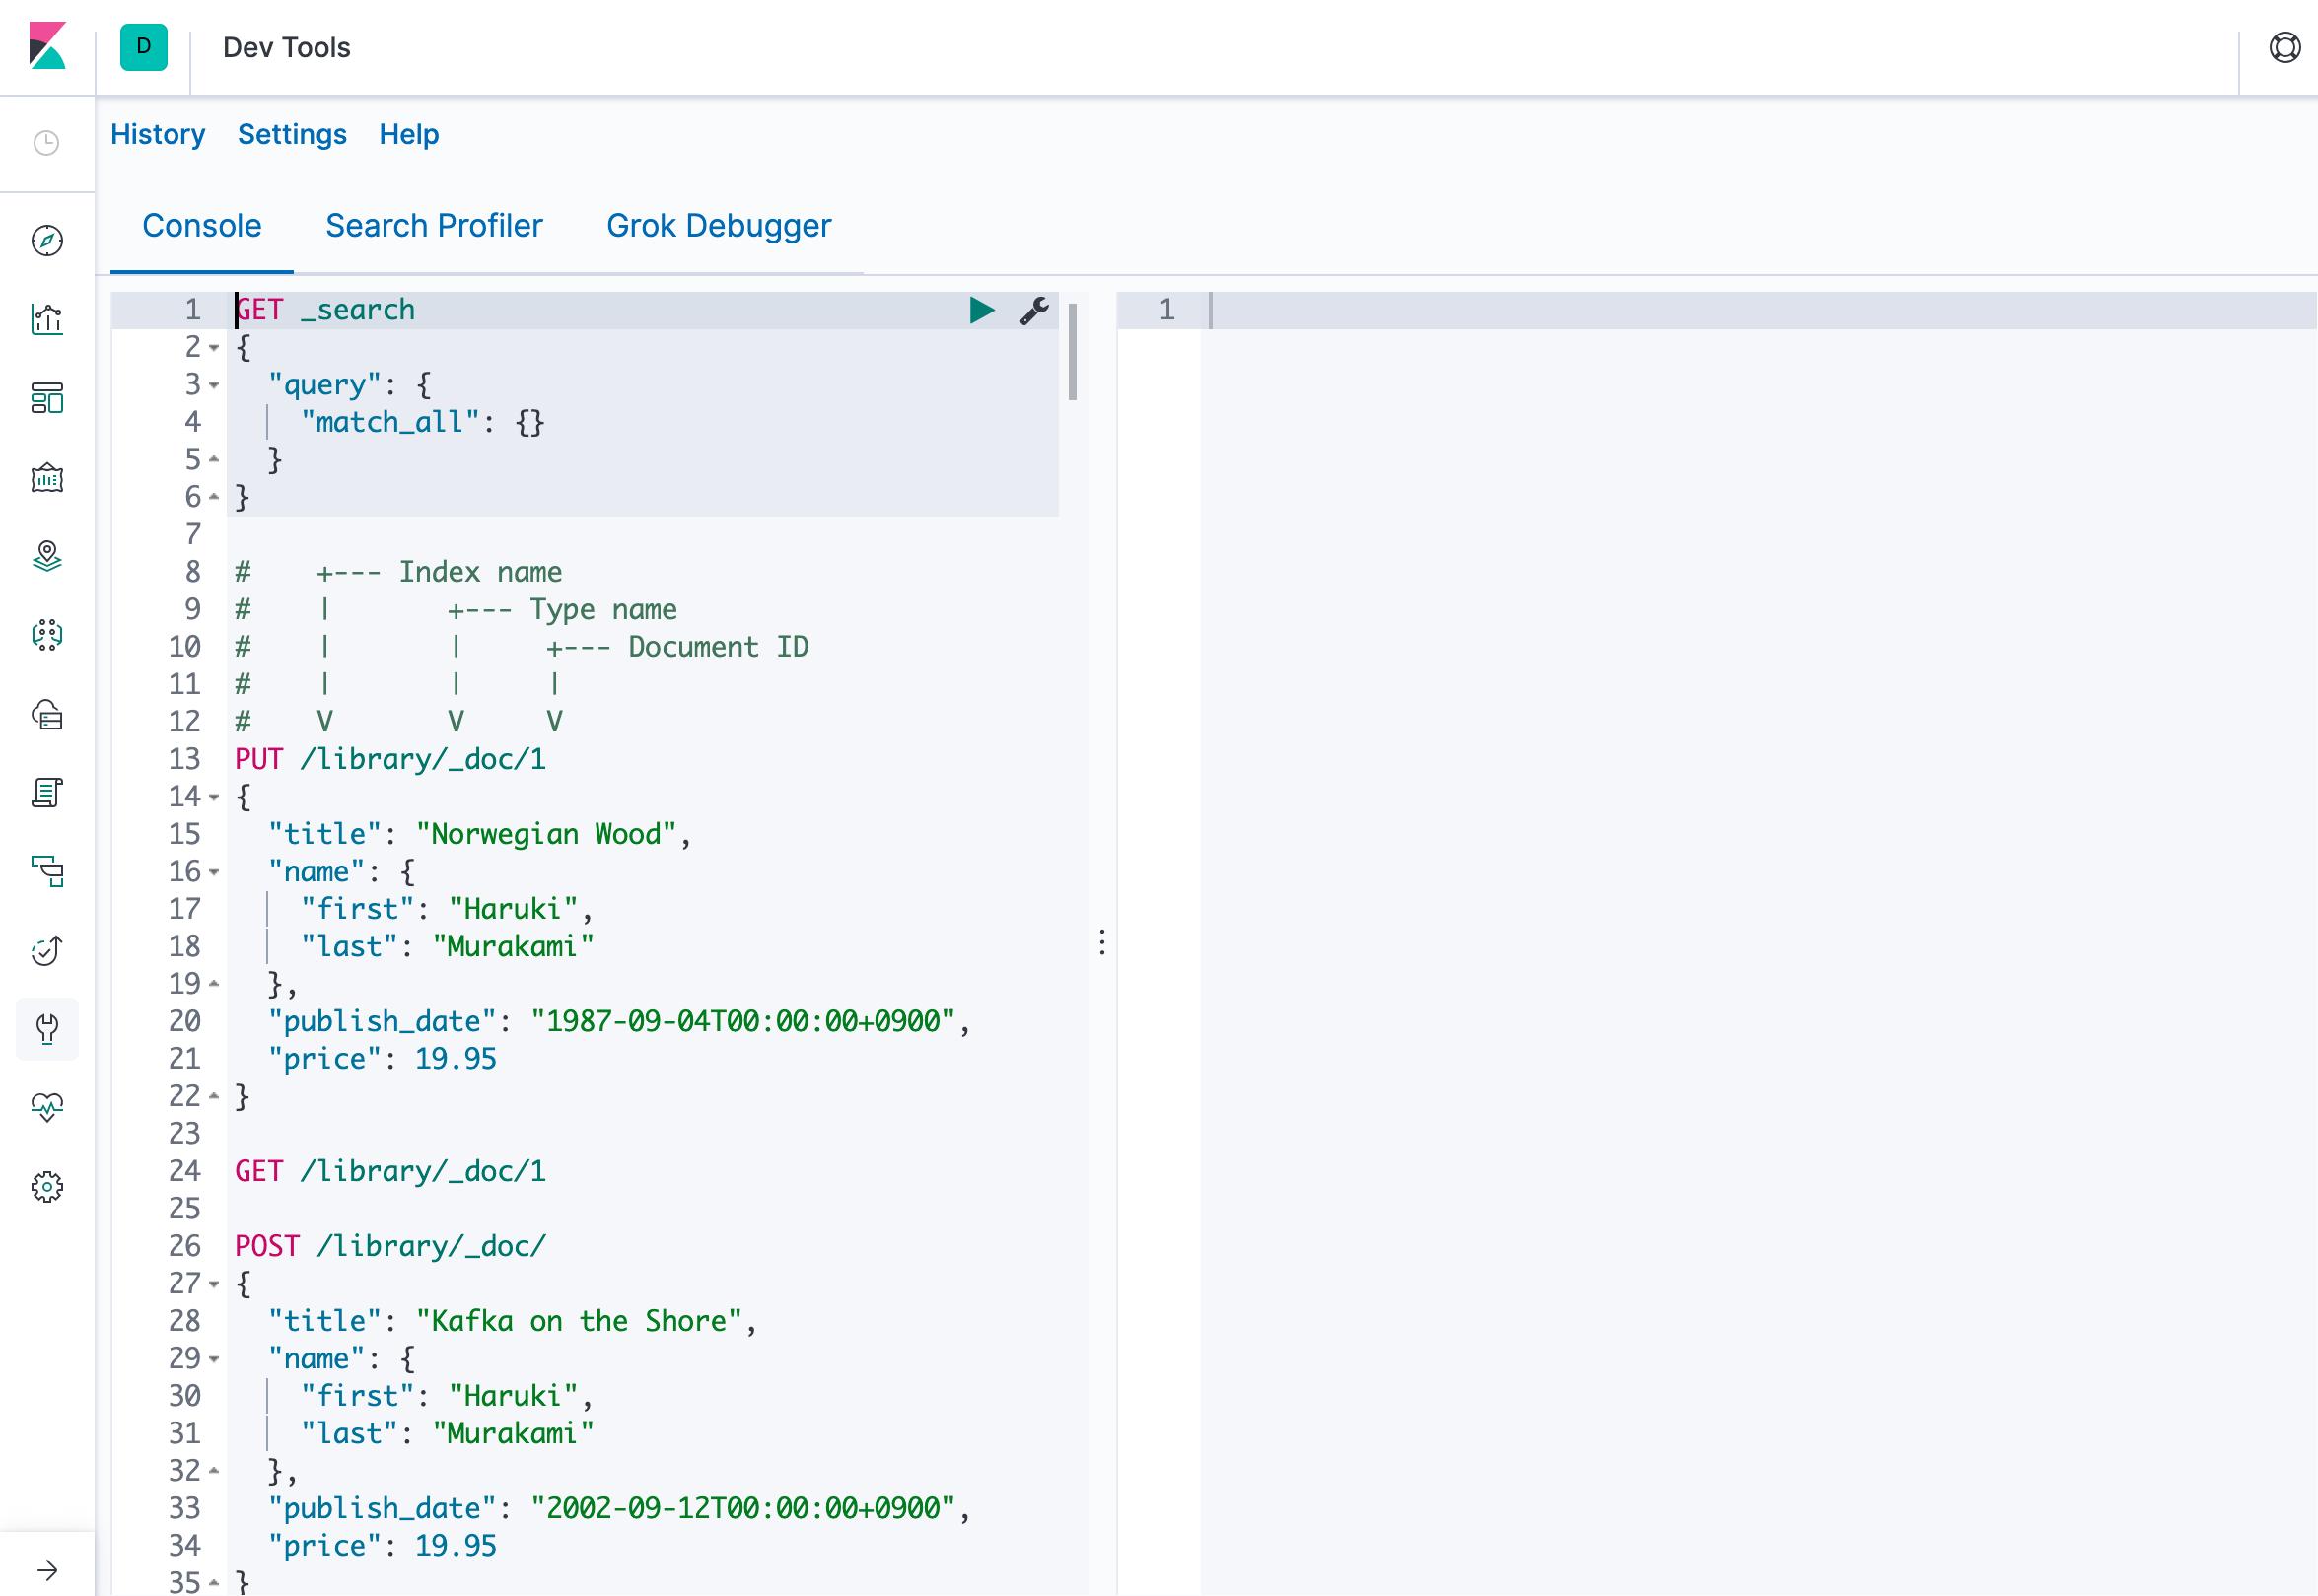 kibana_7_0_0_dev_tools.png